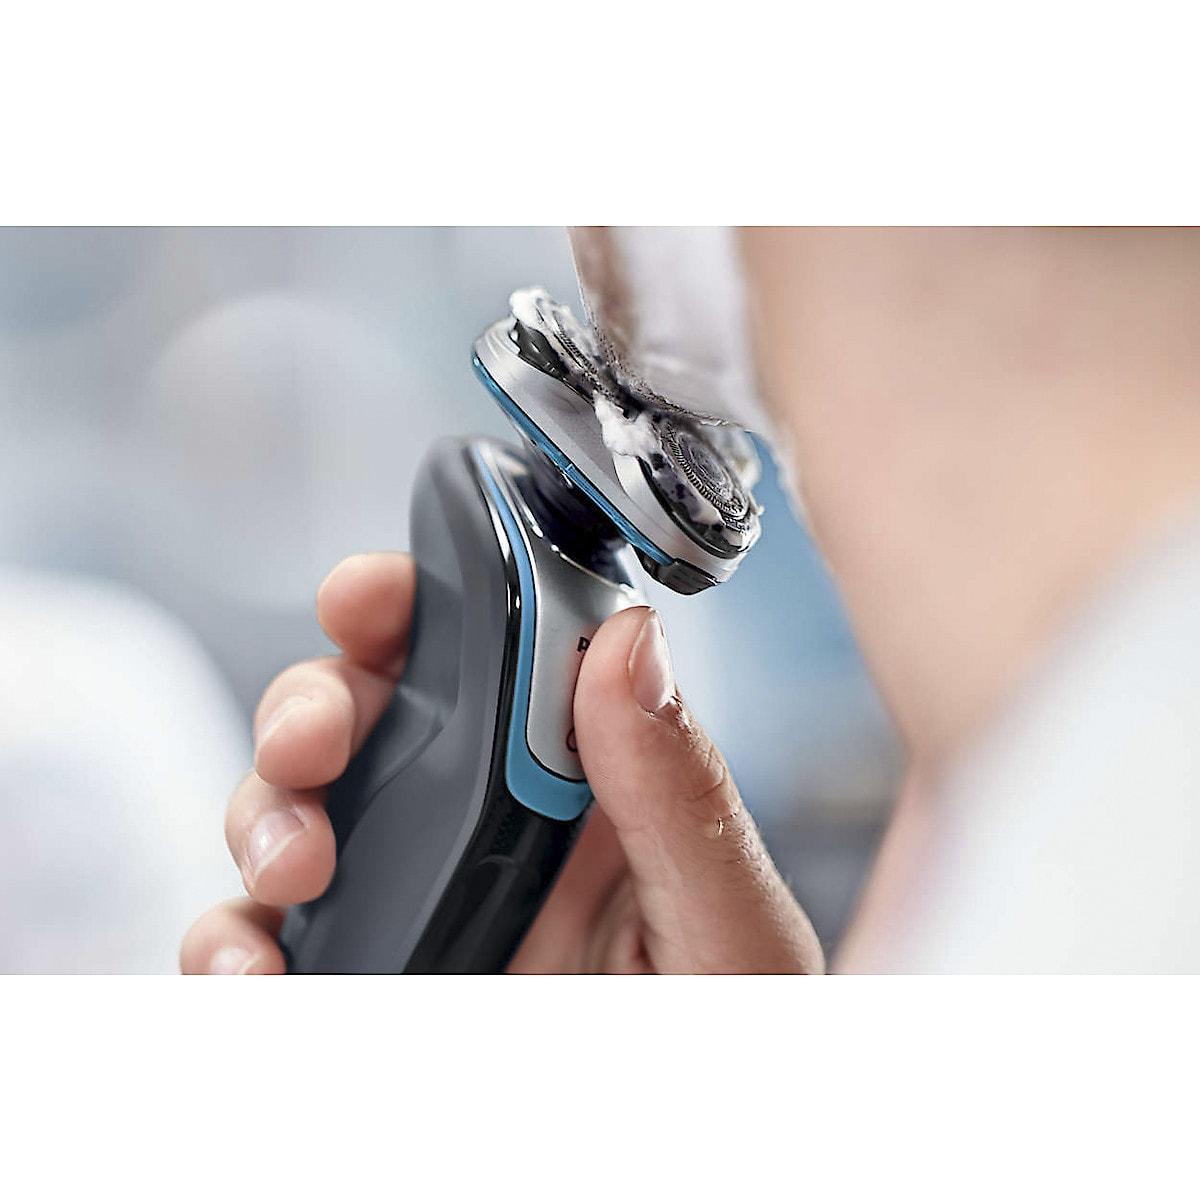 Philips AquaTouch S5400/06 barbermaskin